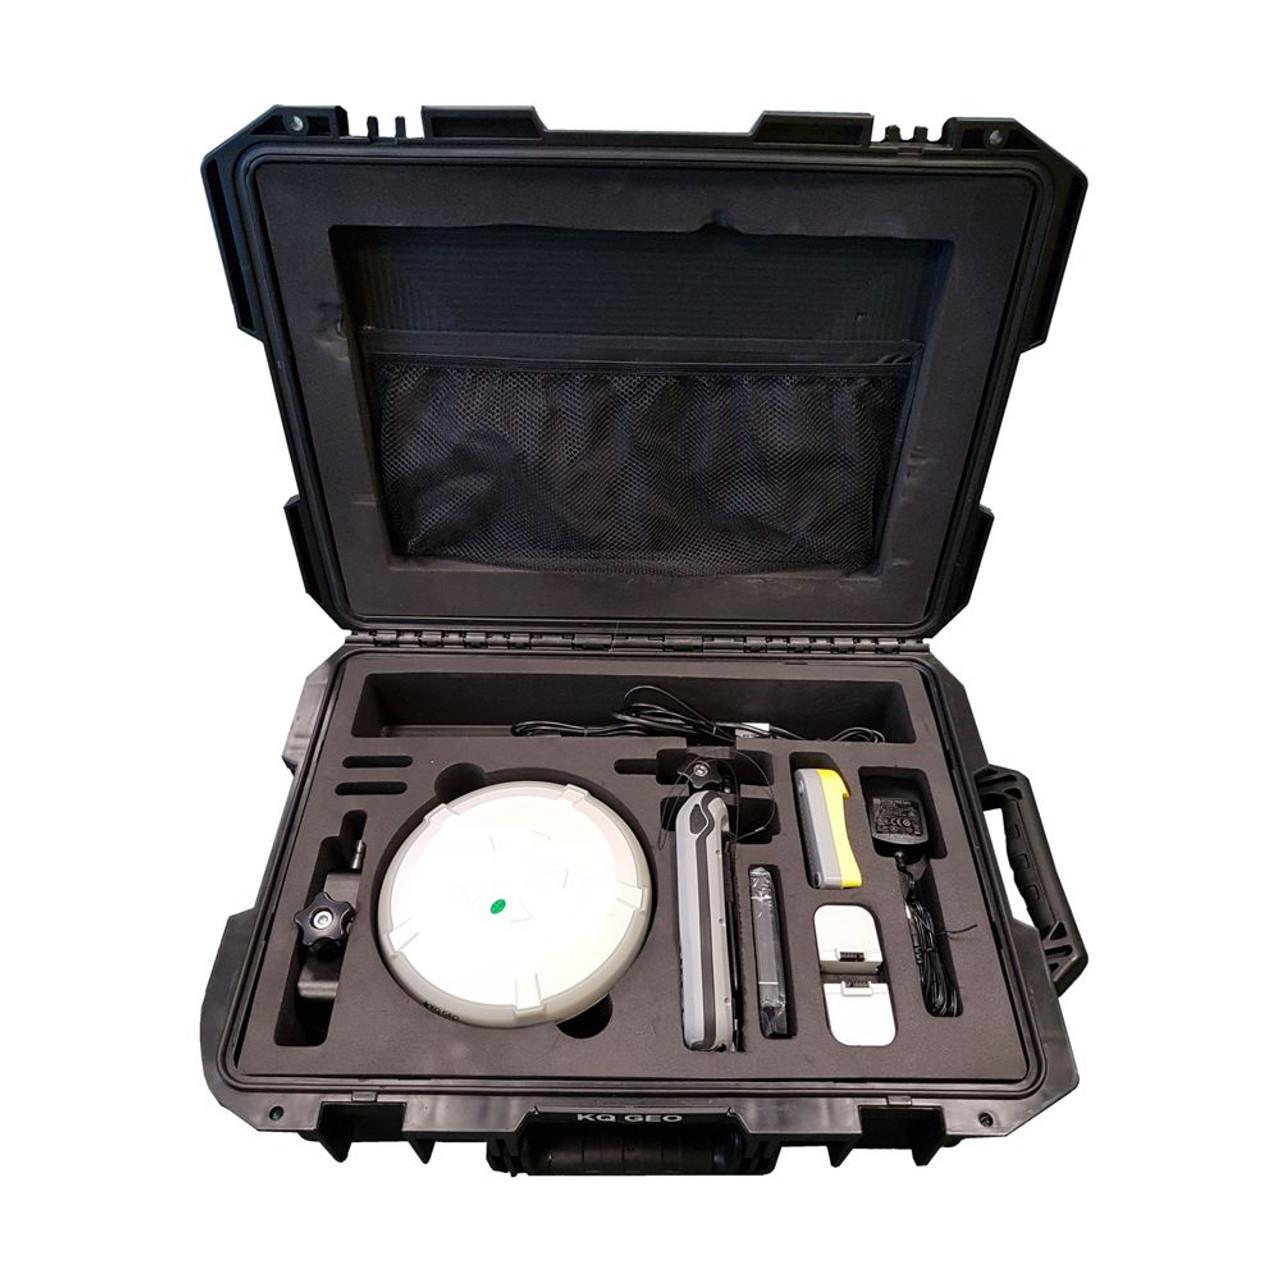 M8 + X11 + Field Genius GNSS RTK Rover Set